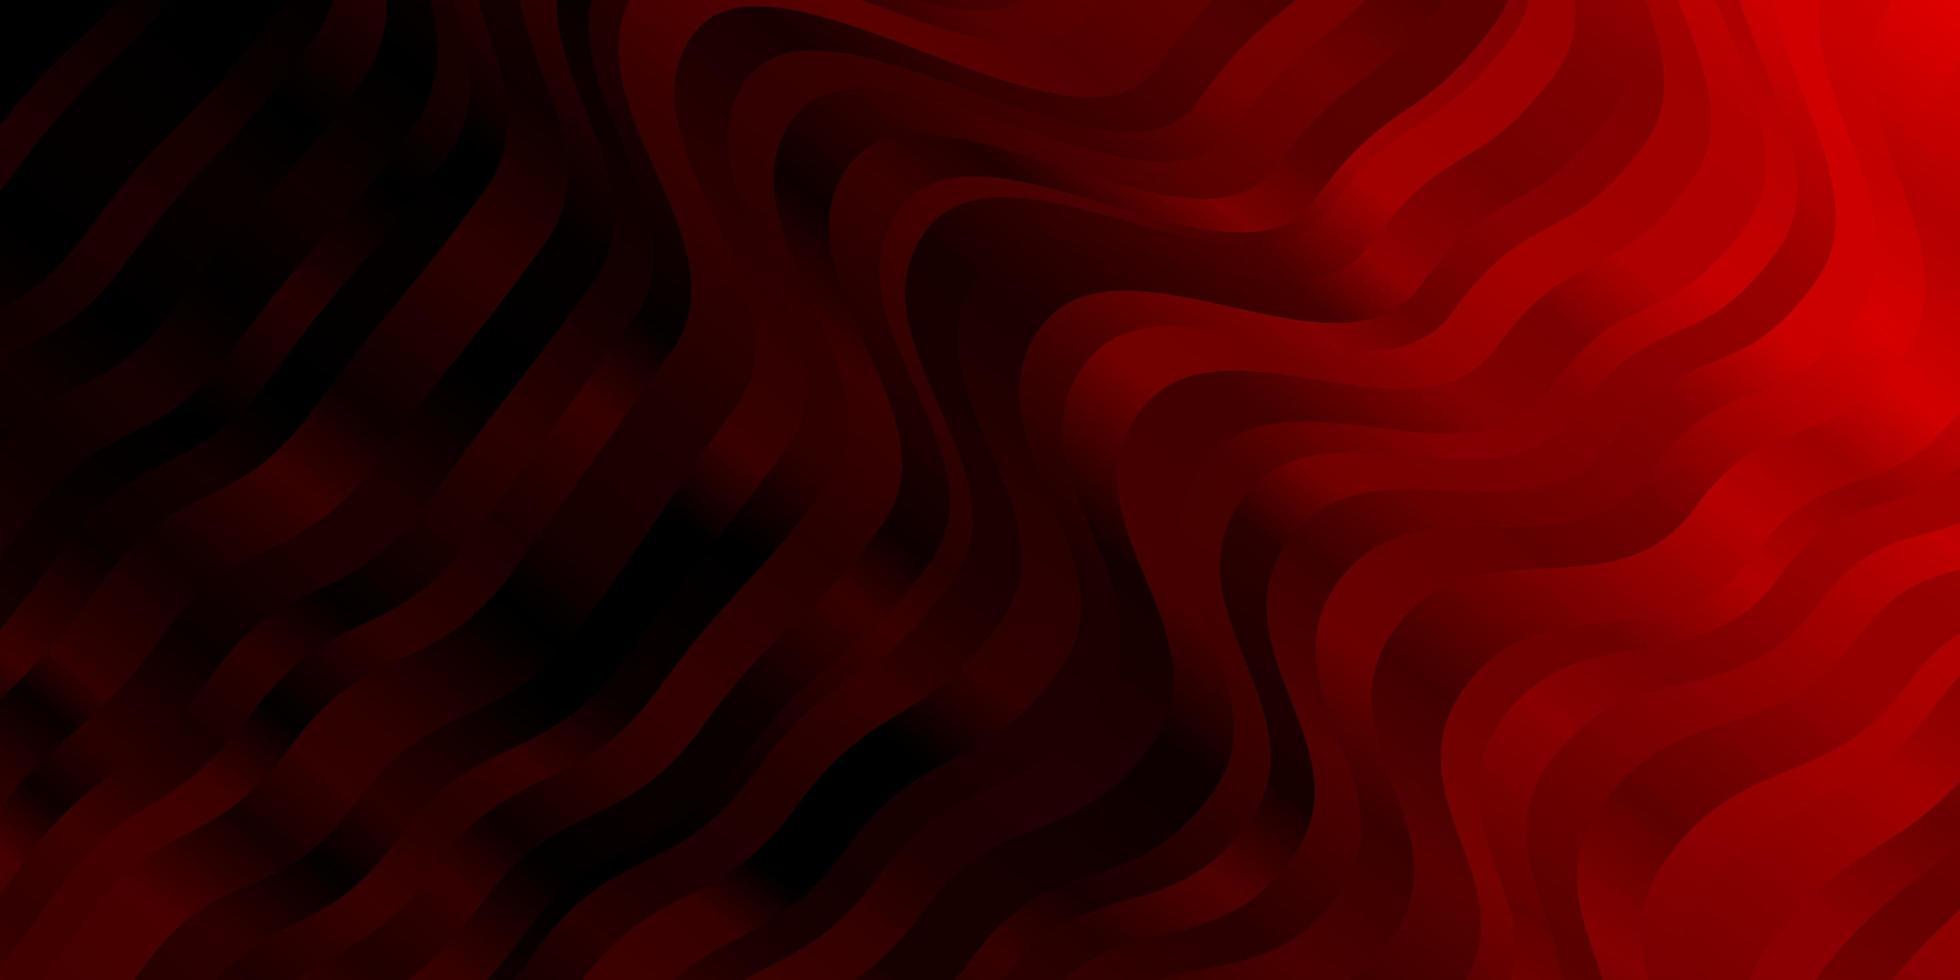 Fondo de vector rojo oscuro con líneas.